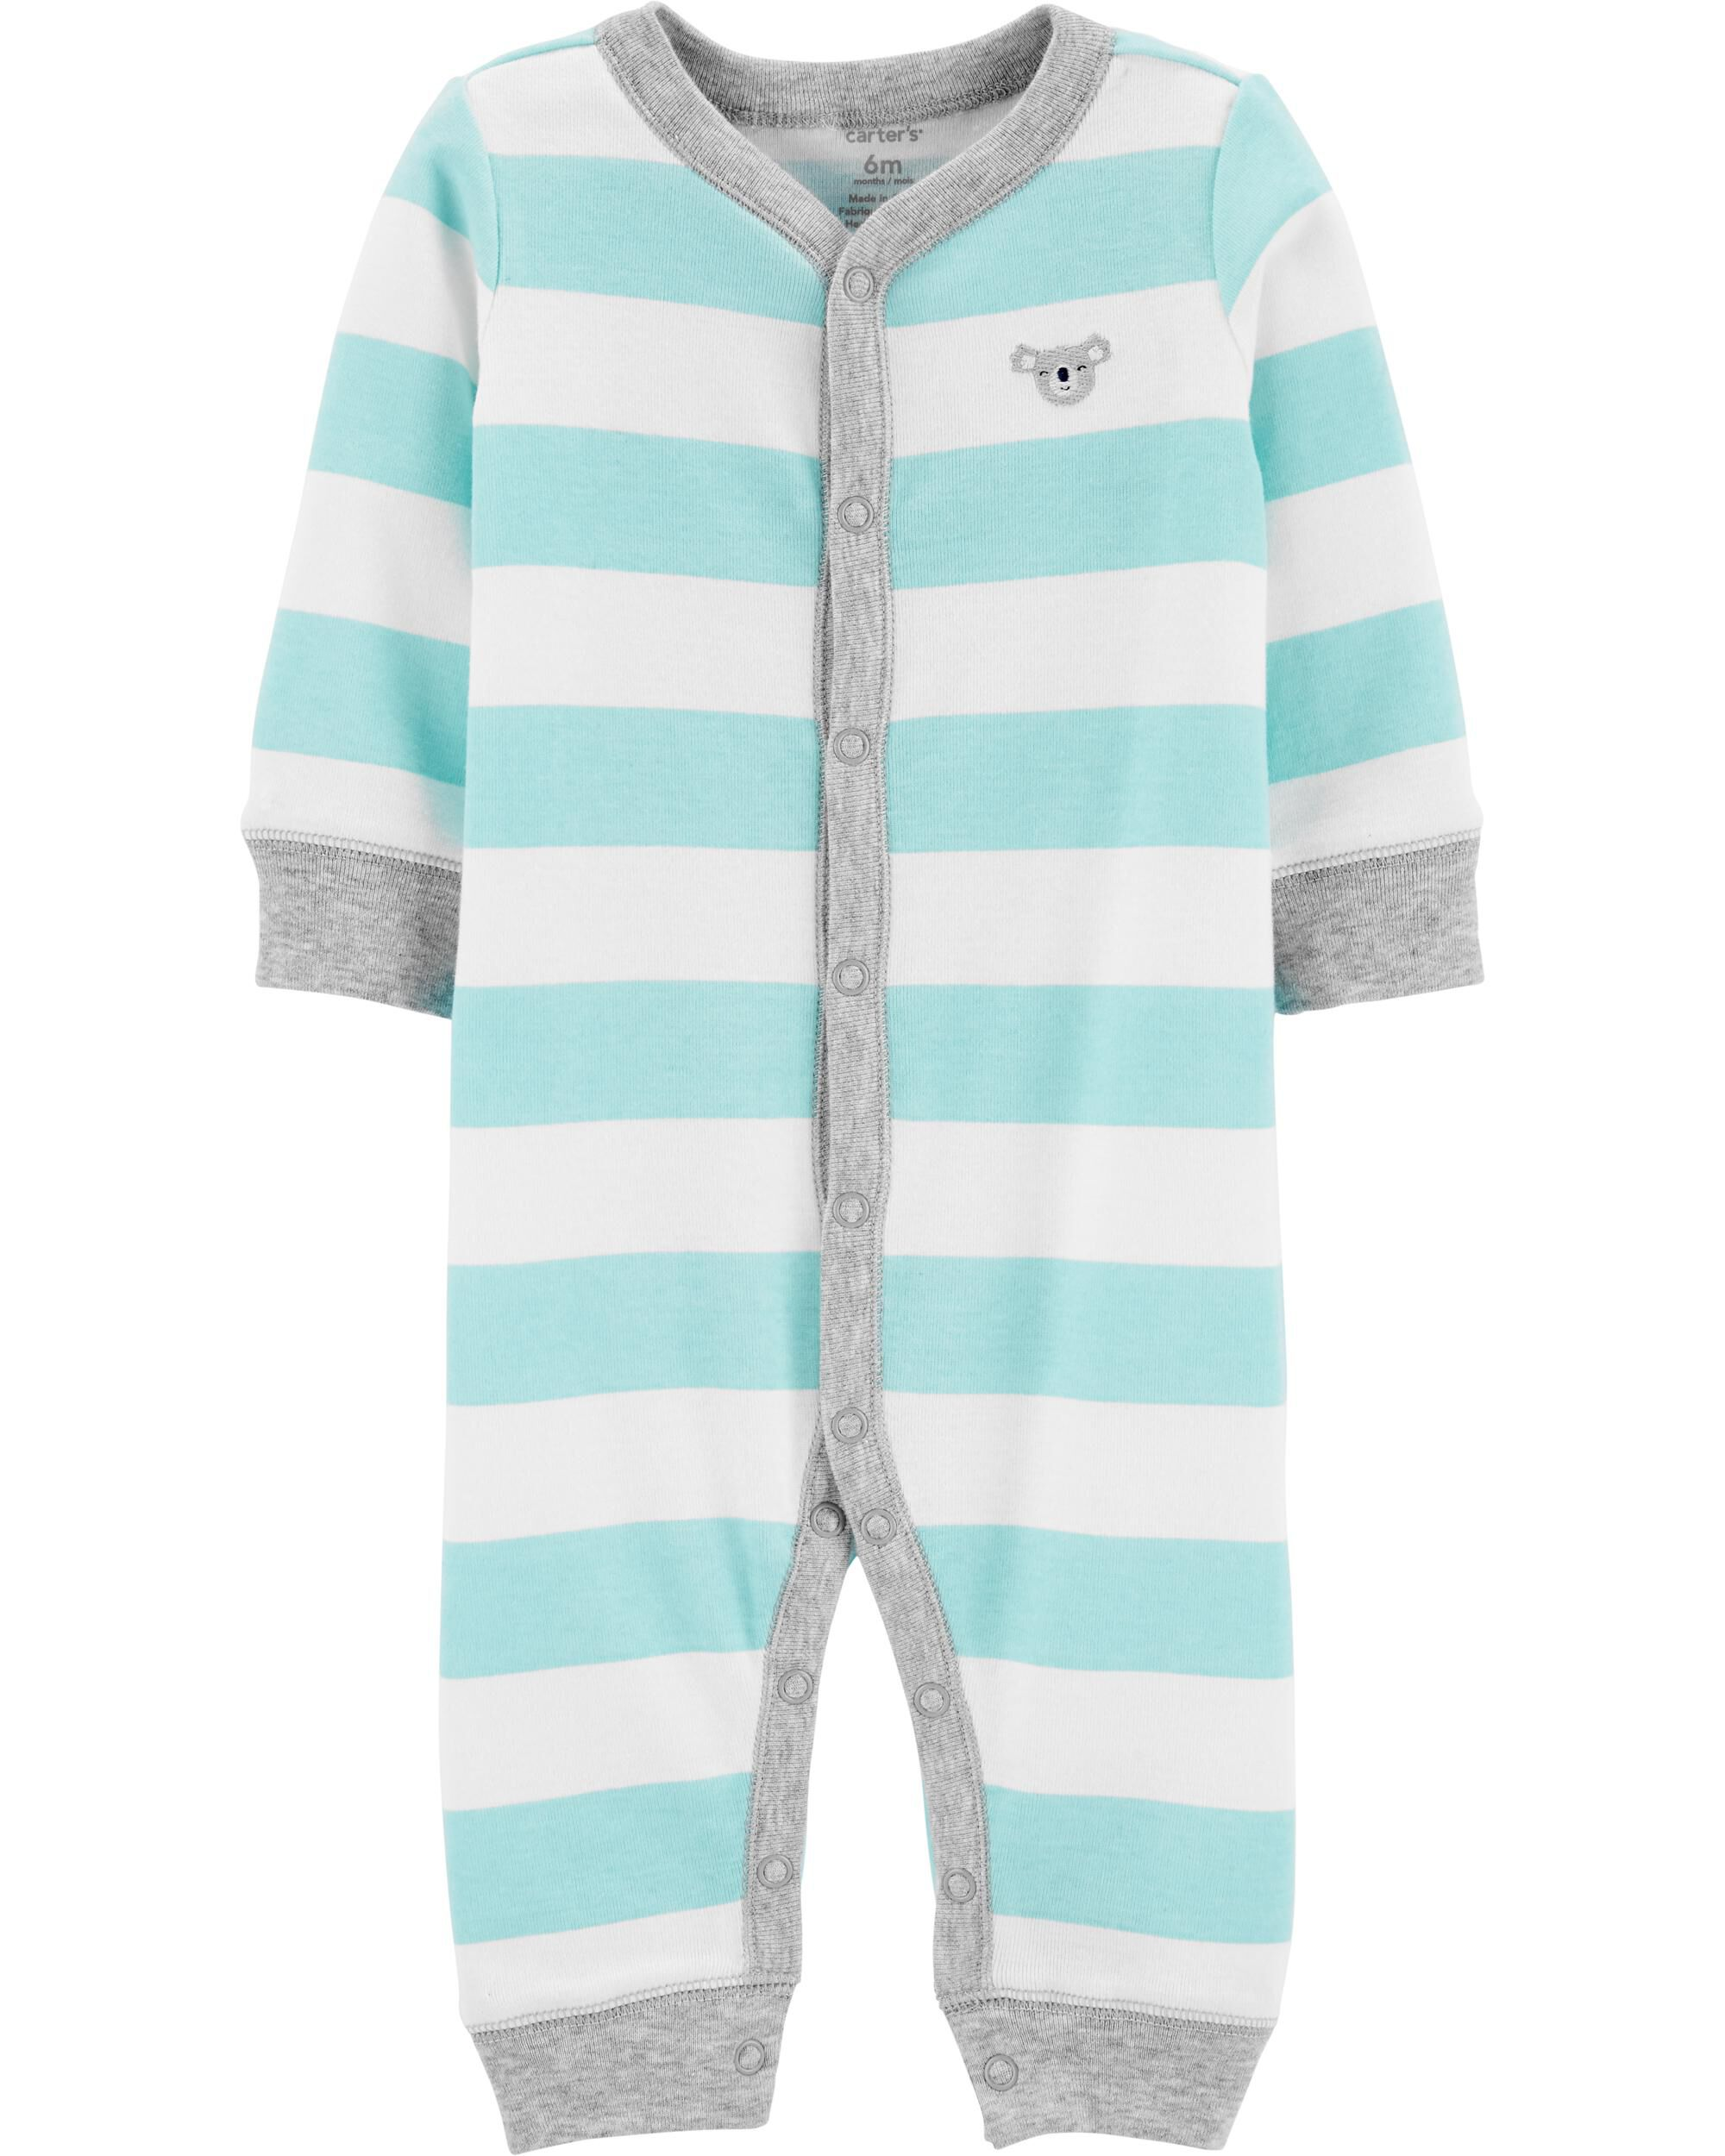 Boy/'s Preemie Football Orange Navy Striped Sleeper Outfit NEW NWT $16 Cotton